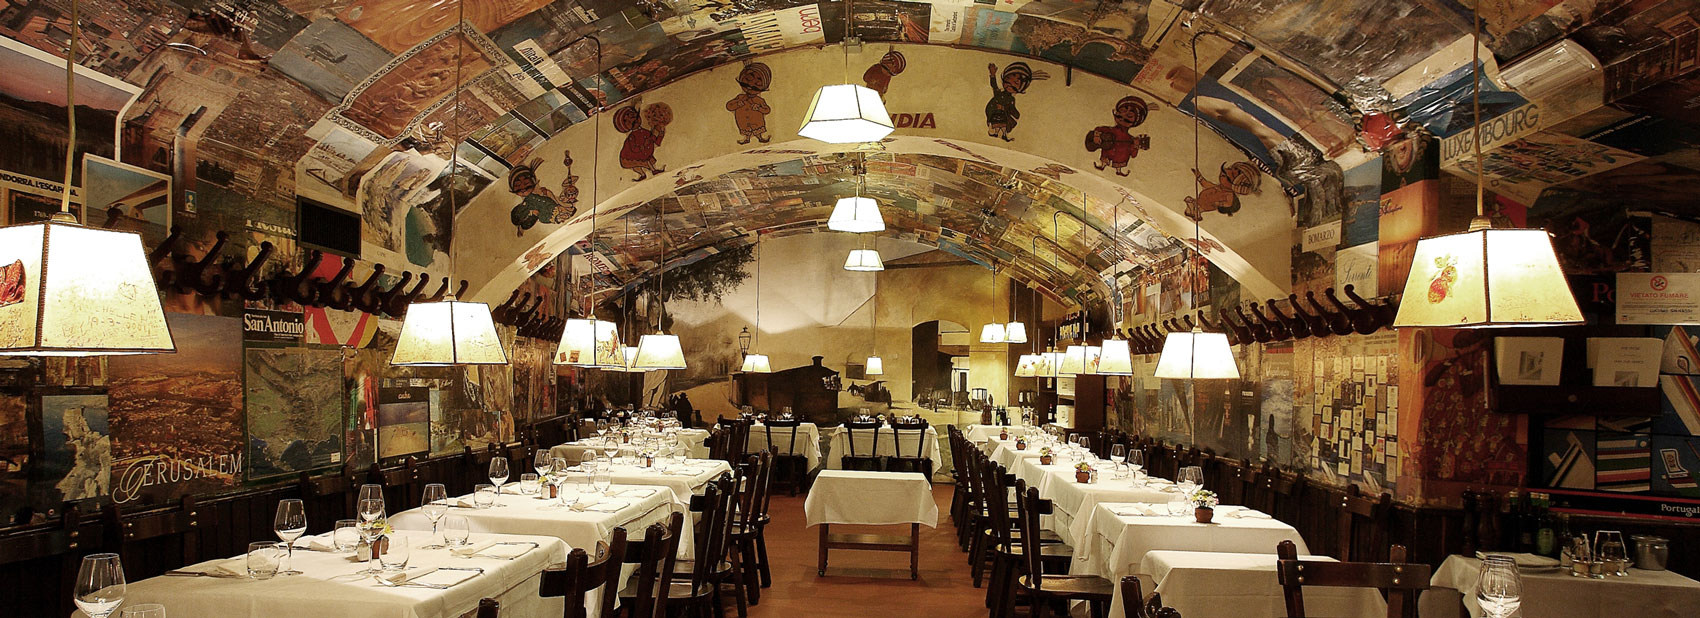 Best Restaurants In Florence Fiorentina Steak Buca Lapi